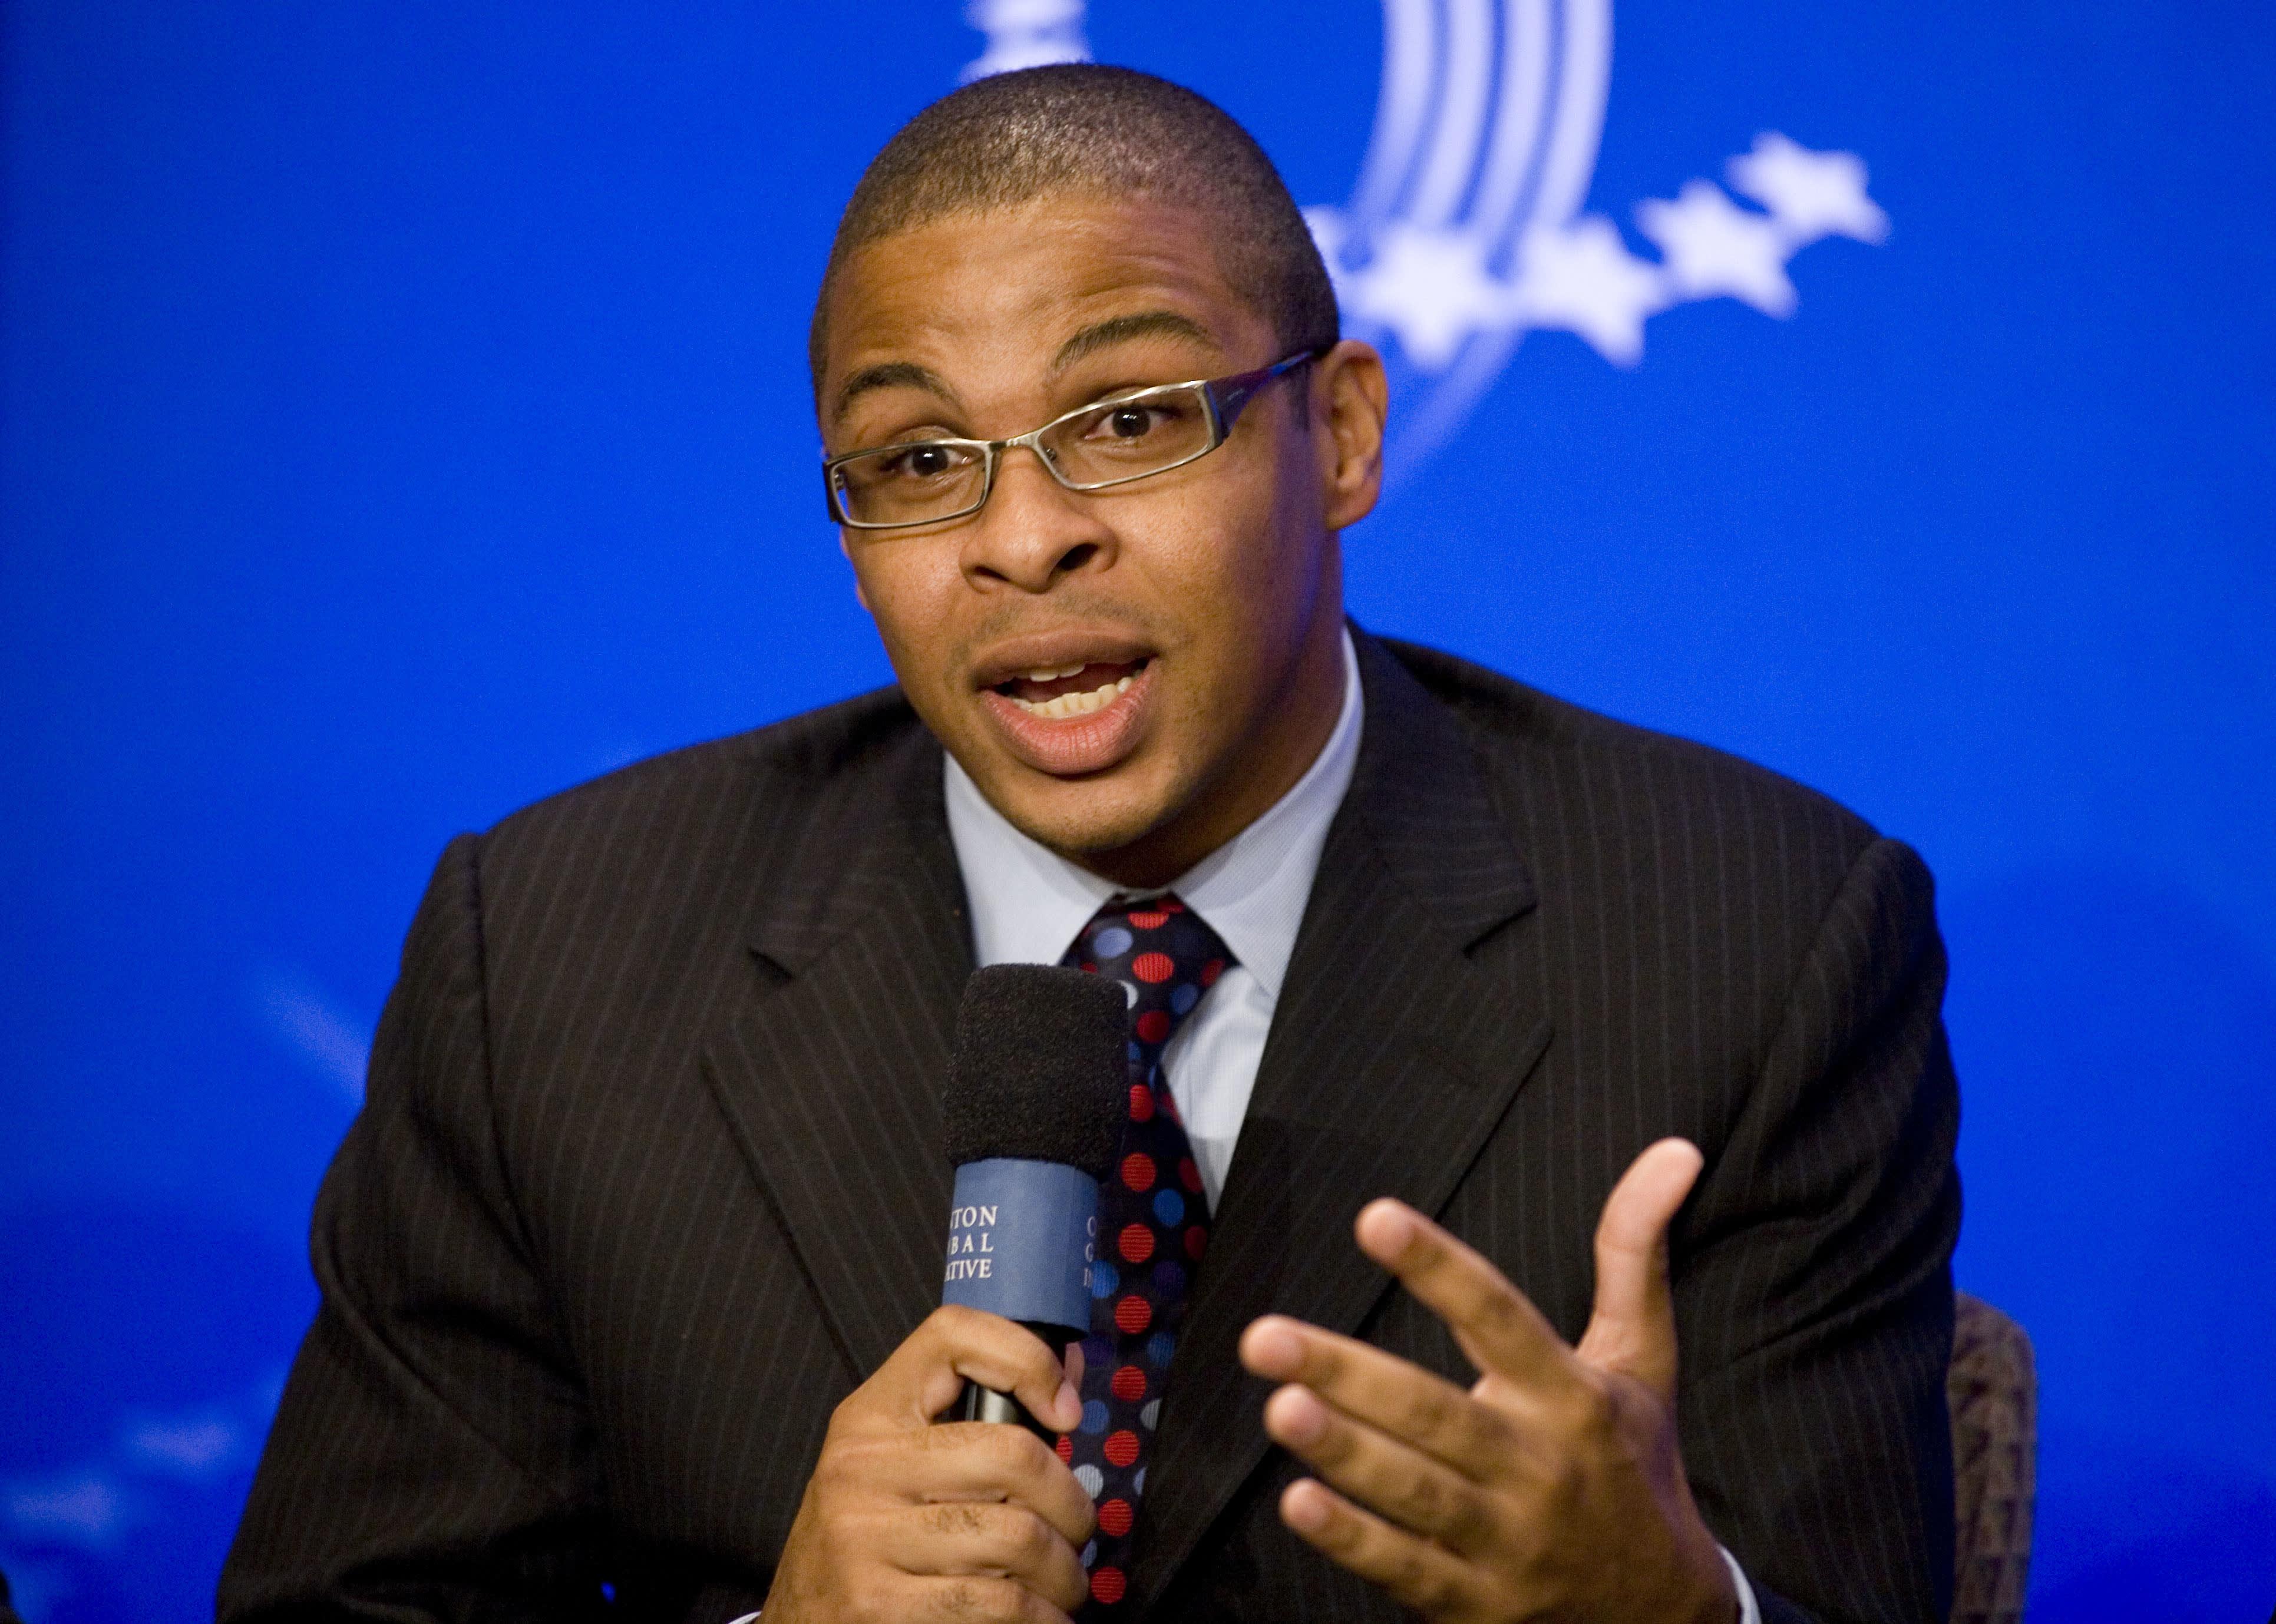 Harvard University professor Roland Fryer speaks at the Clinton Global Initiative in New York on Sept. 25, 2008.